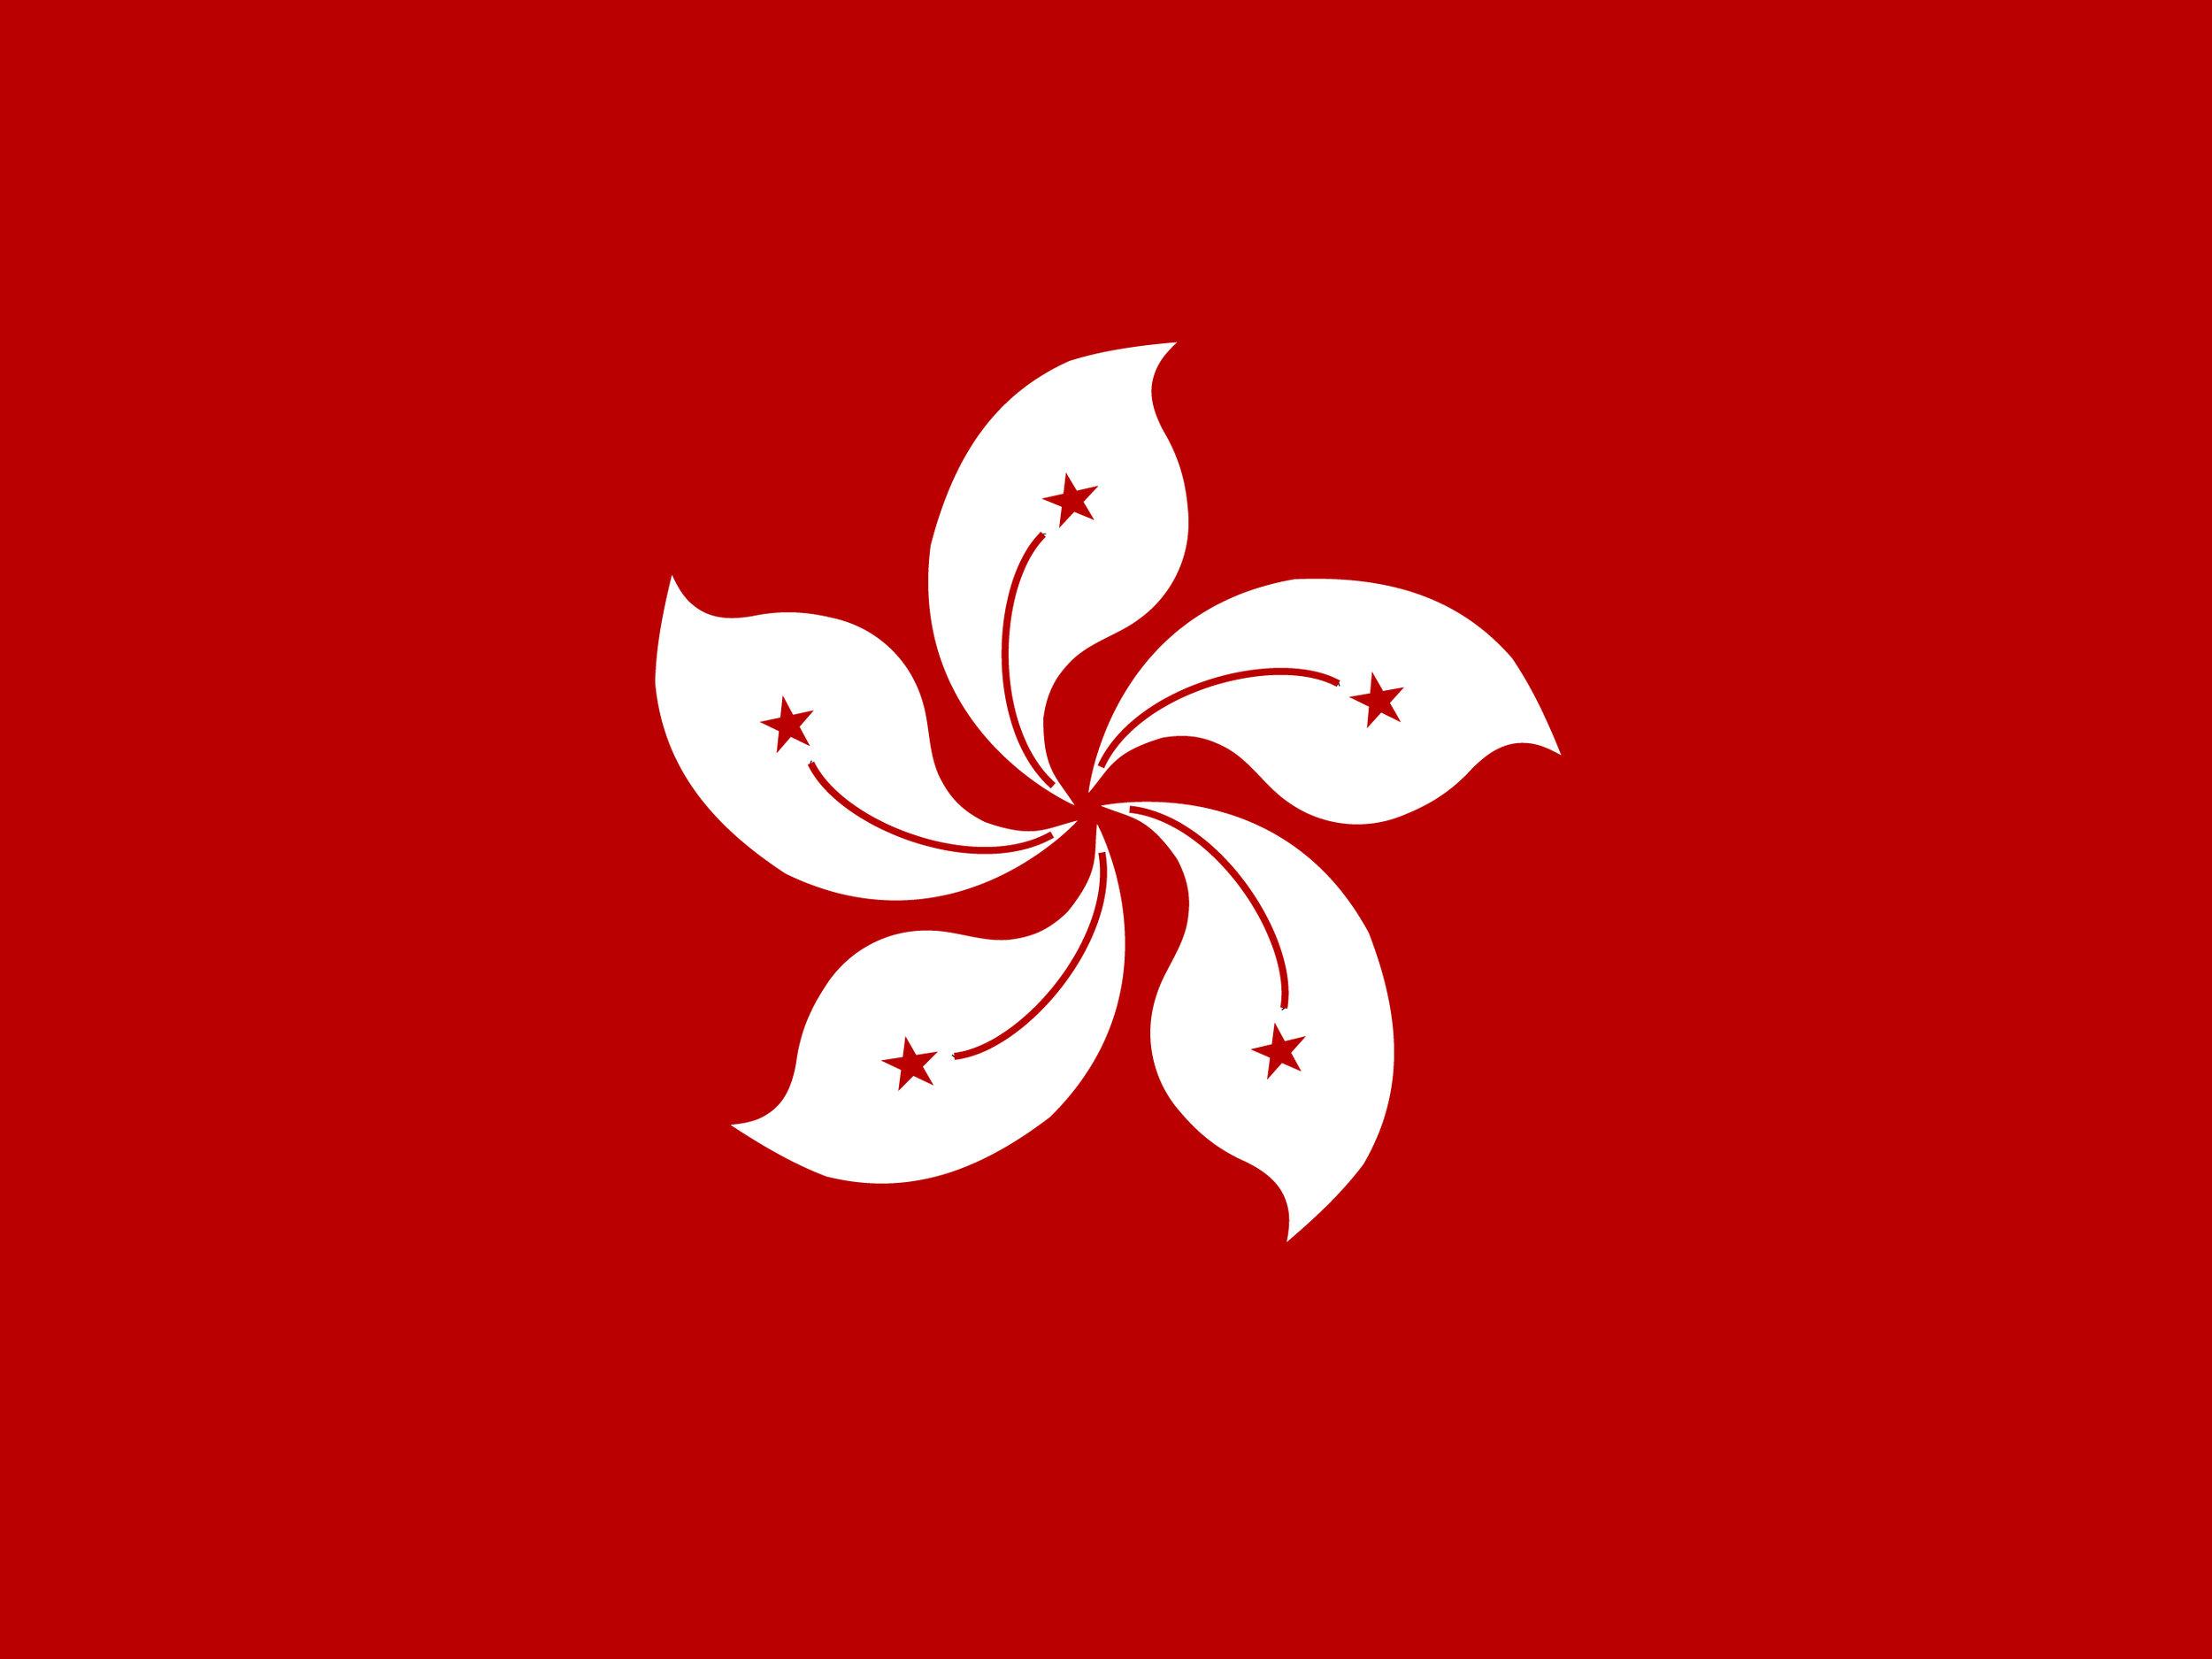 014-Hong-Kong.jpg